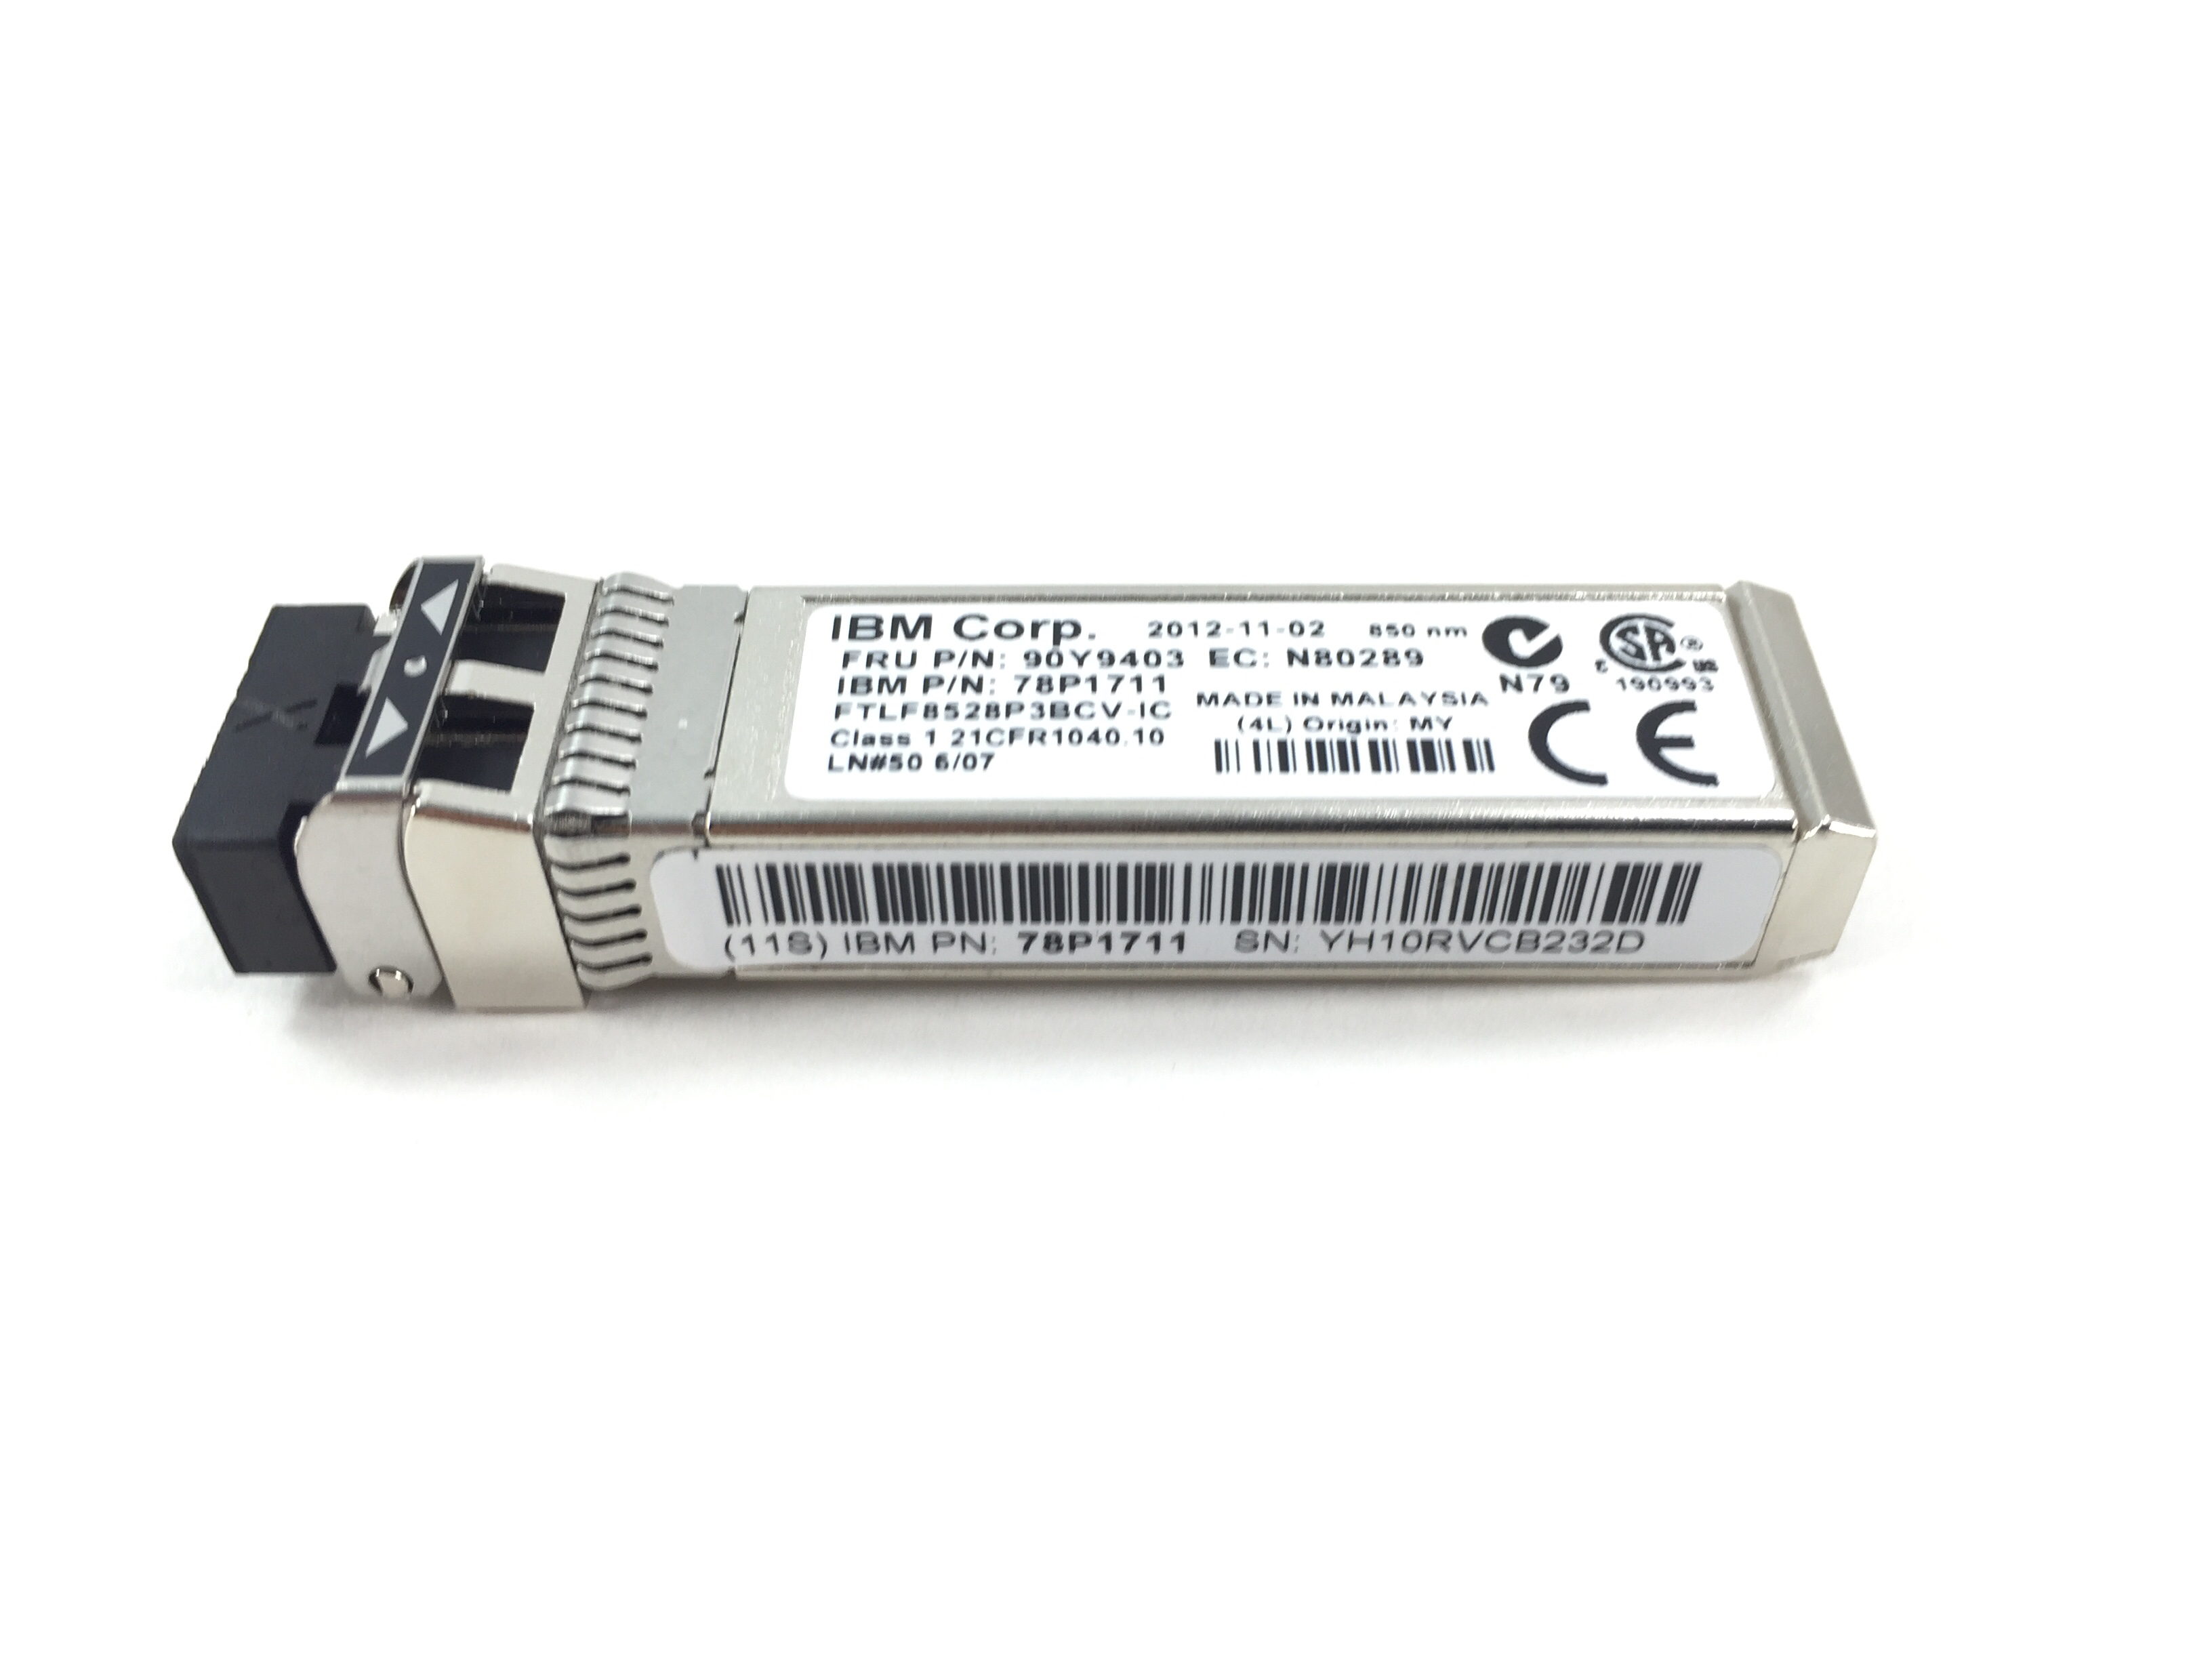 IBM Ftlf8528P3Bcv-Ic 8GB SFP Sw Optical Transceiver (90Y9403)